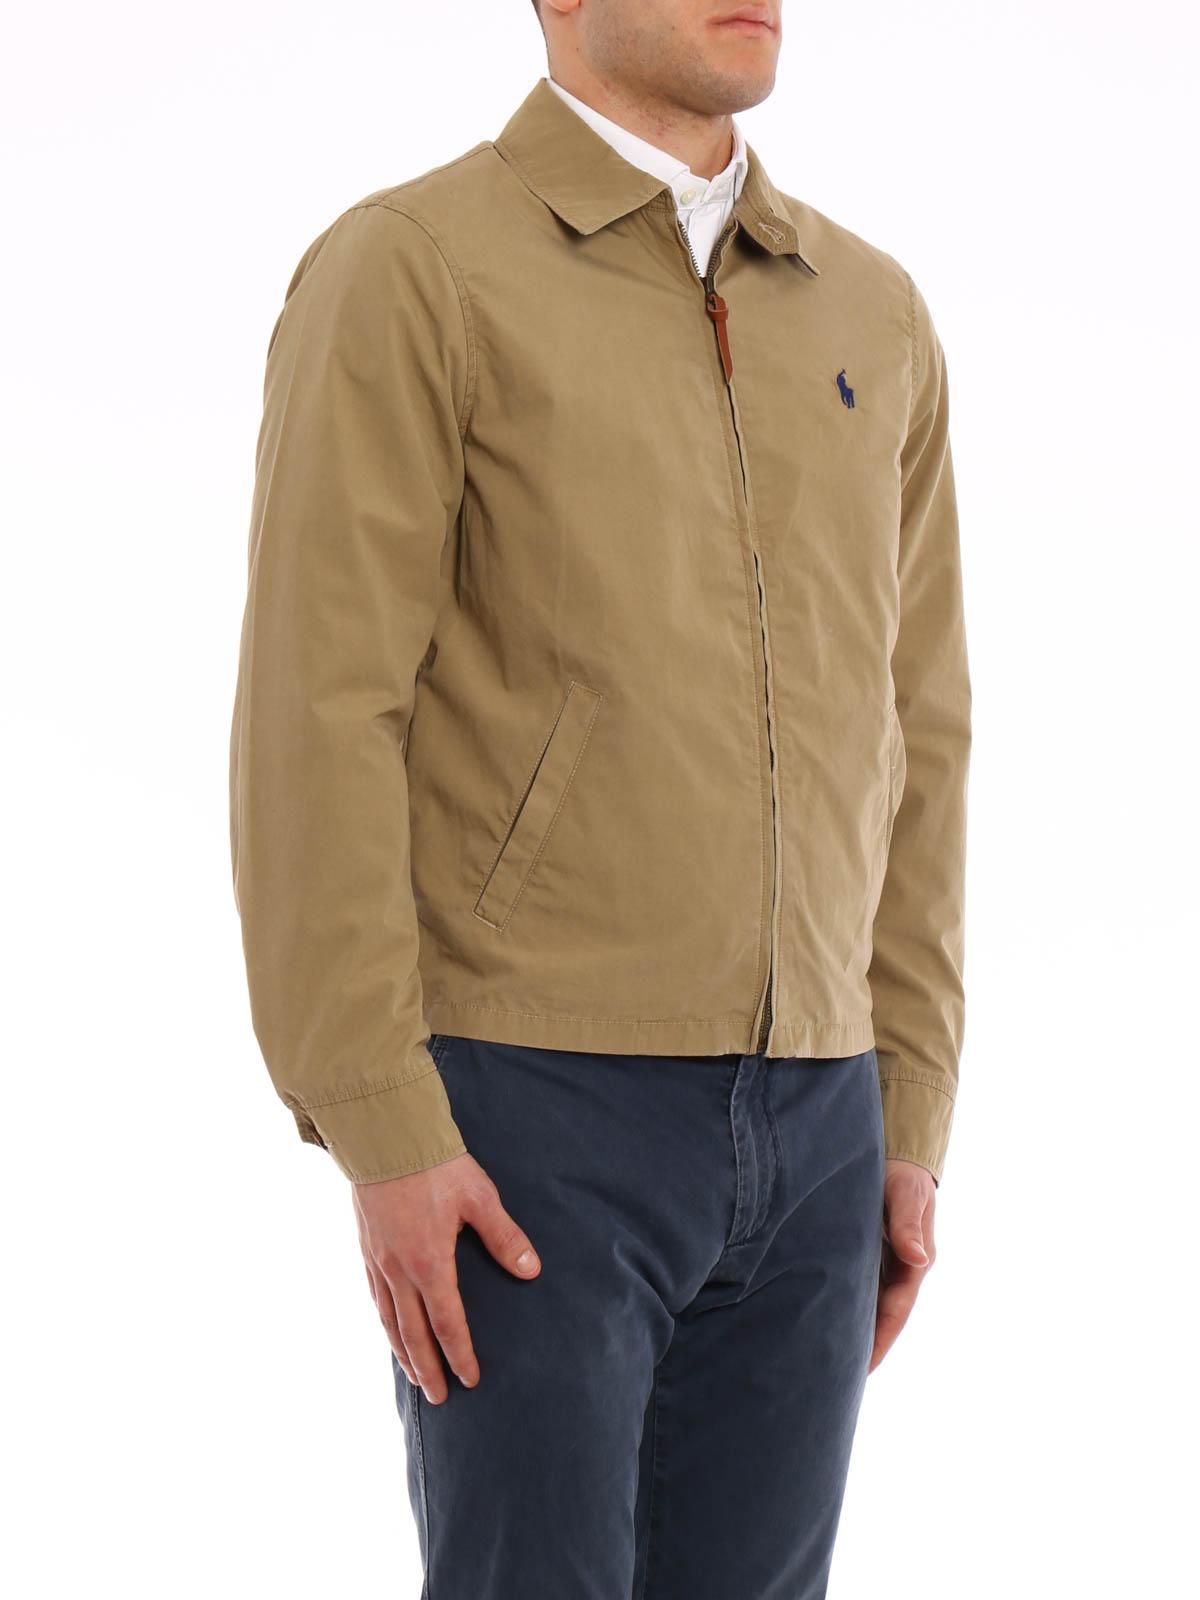 sale retailer 73d9d dcf1d Polo Ralph Lauren - Giubbotto di cotone - giacche casual ...